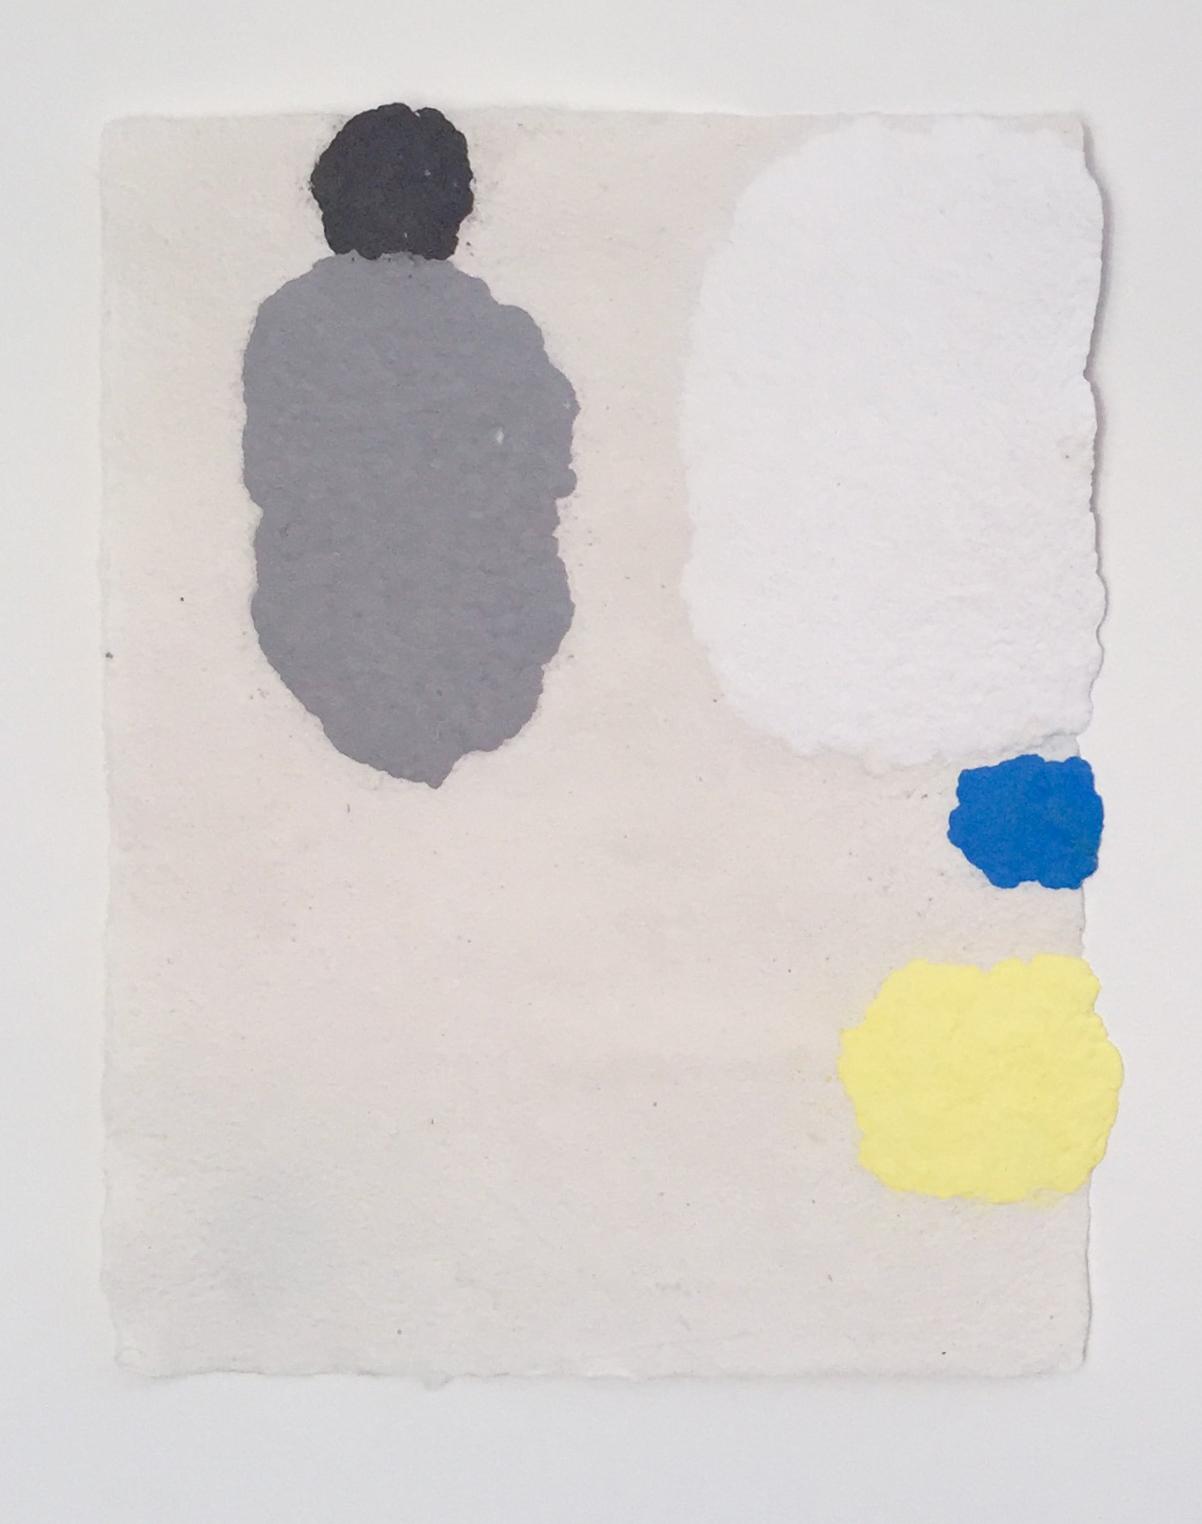 Hyun , 2018, cotton futon pulp painting, 13 x 17 inches